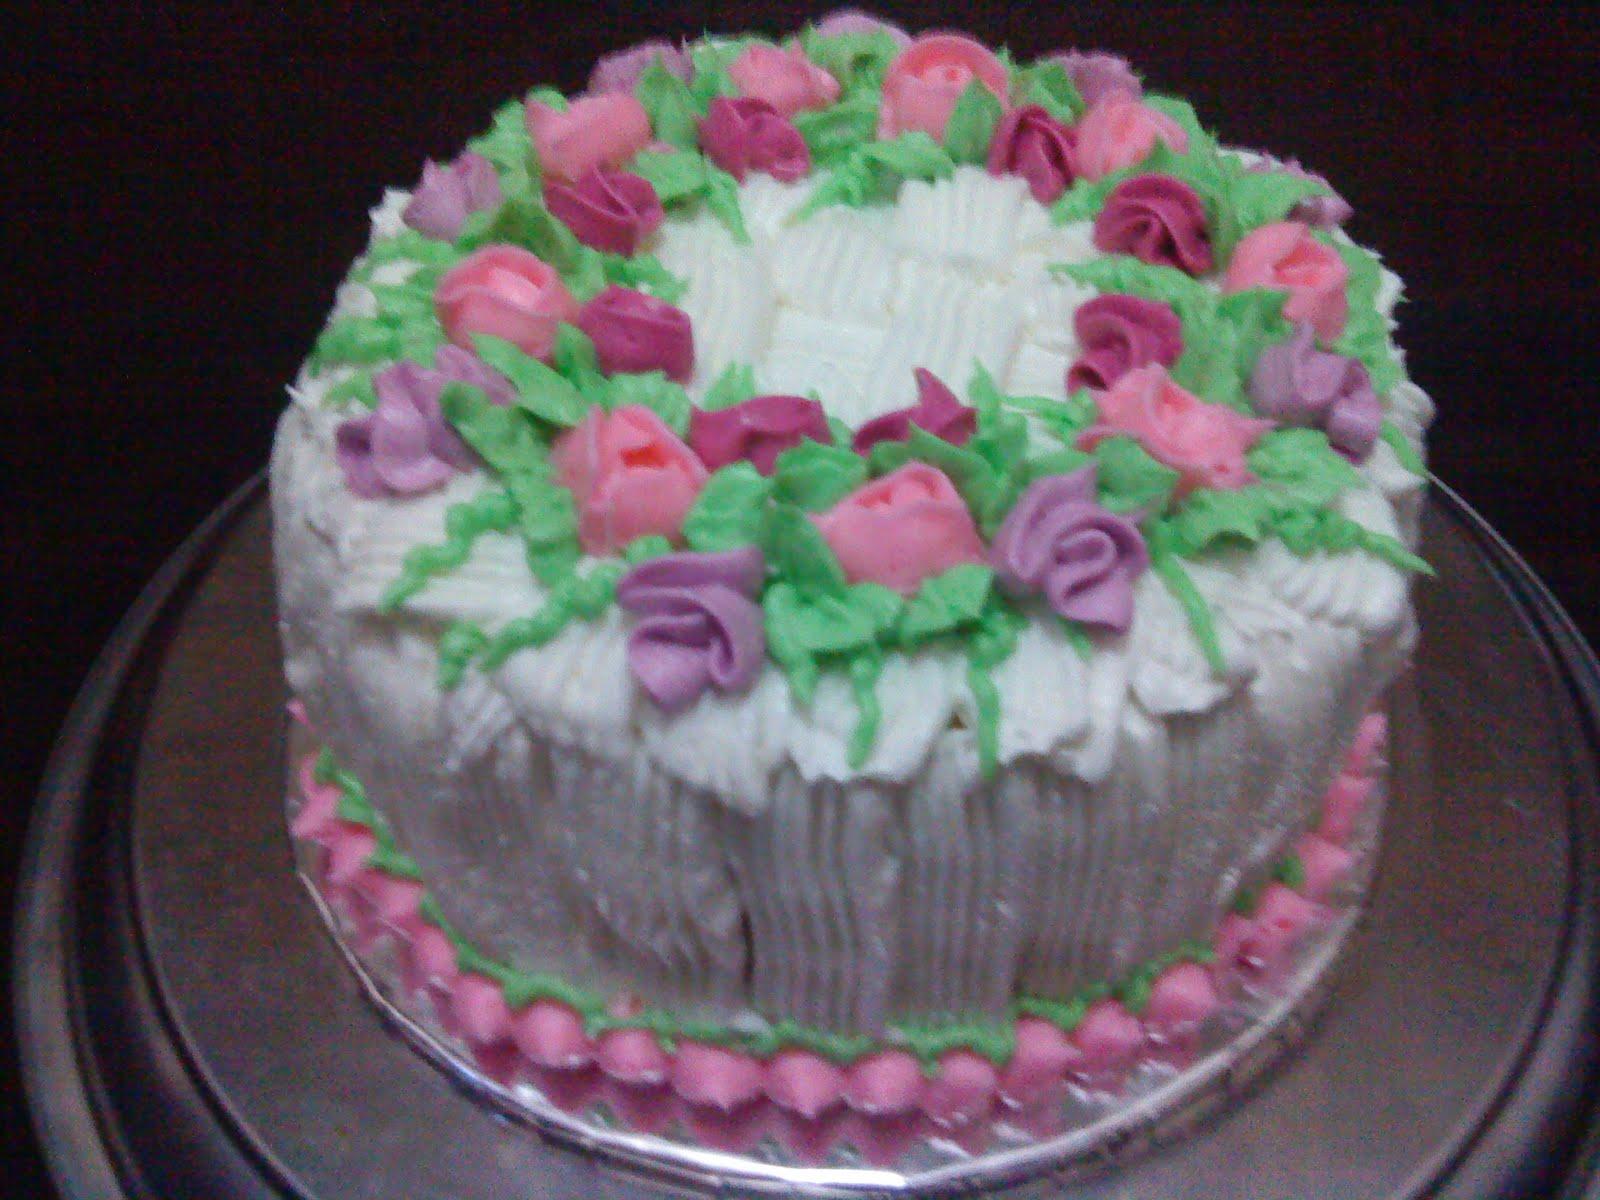 BONBON CAKE CATERING